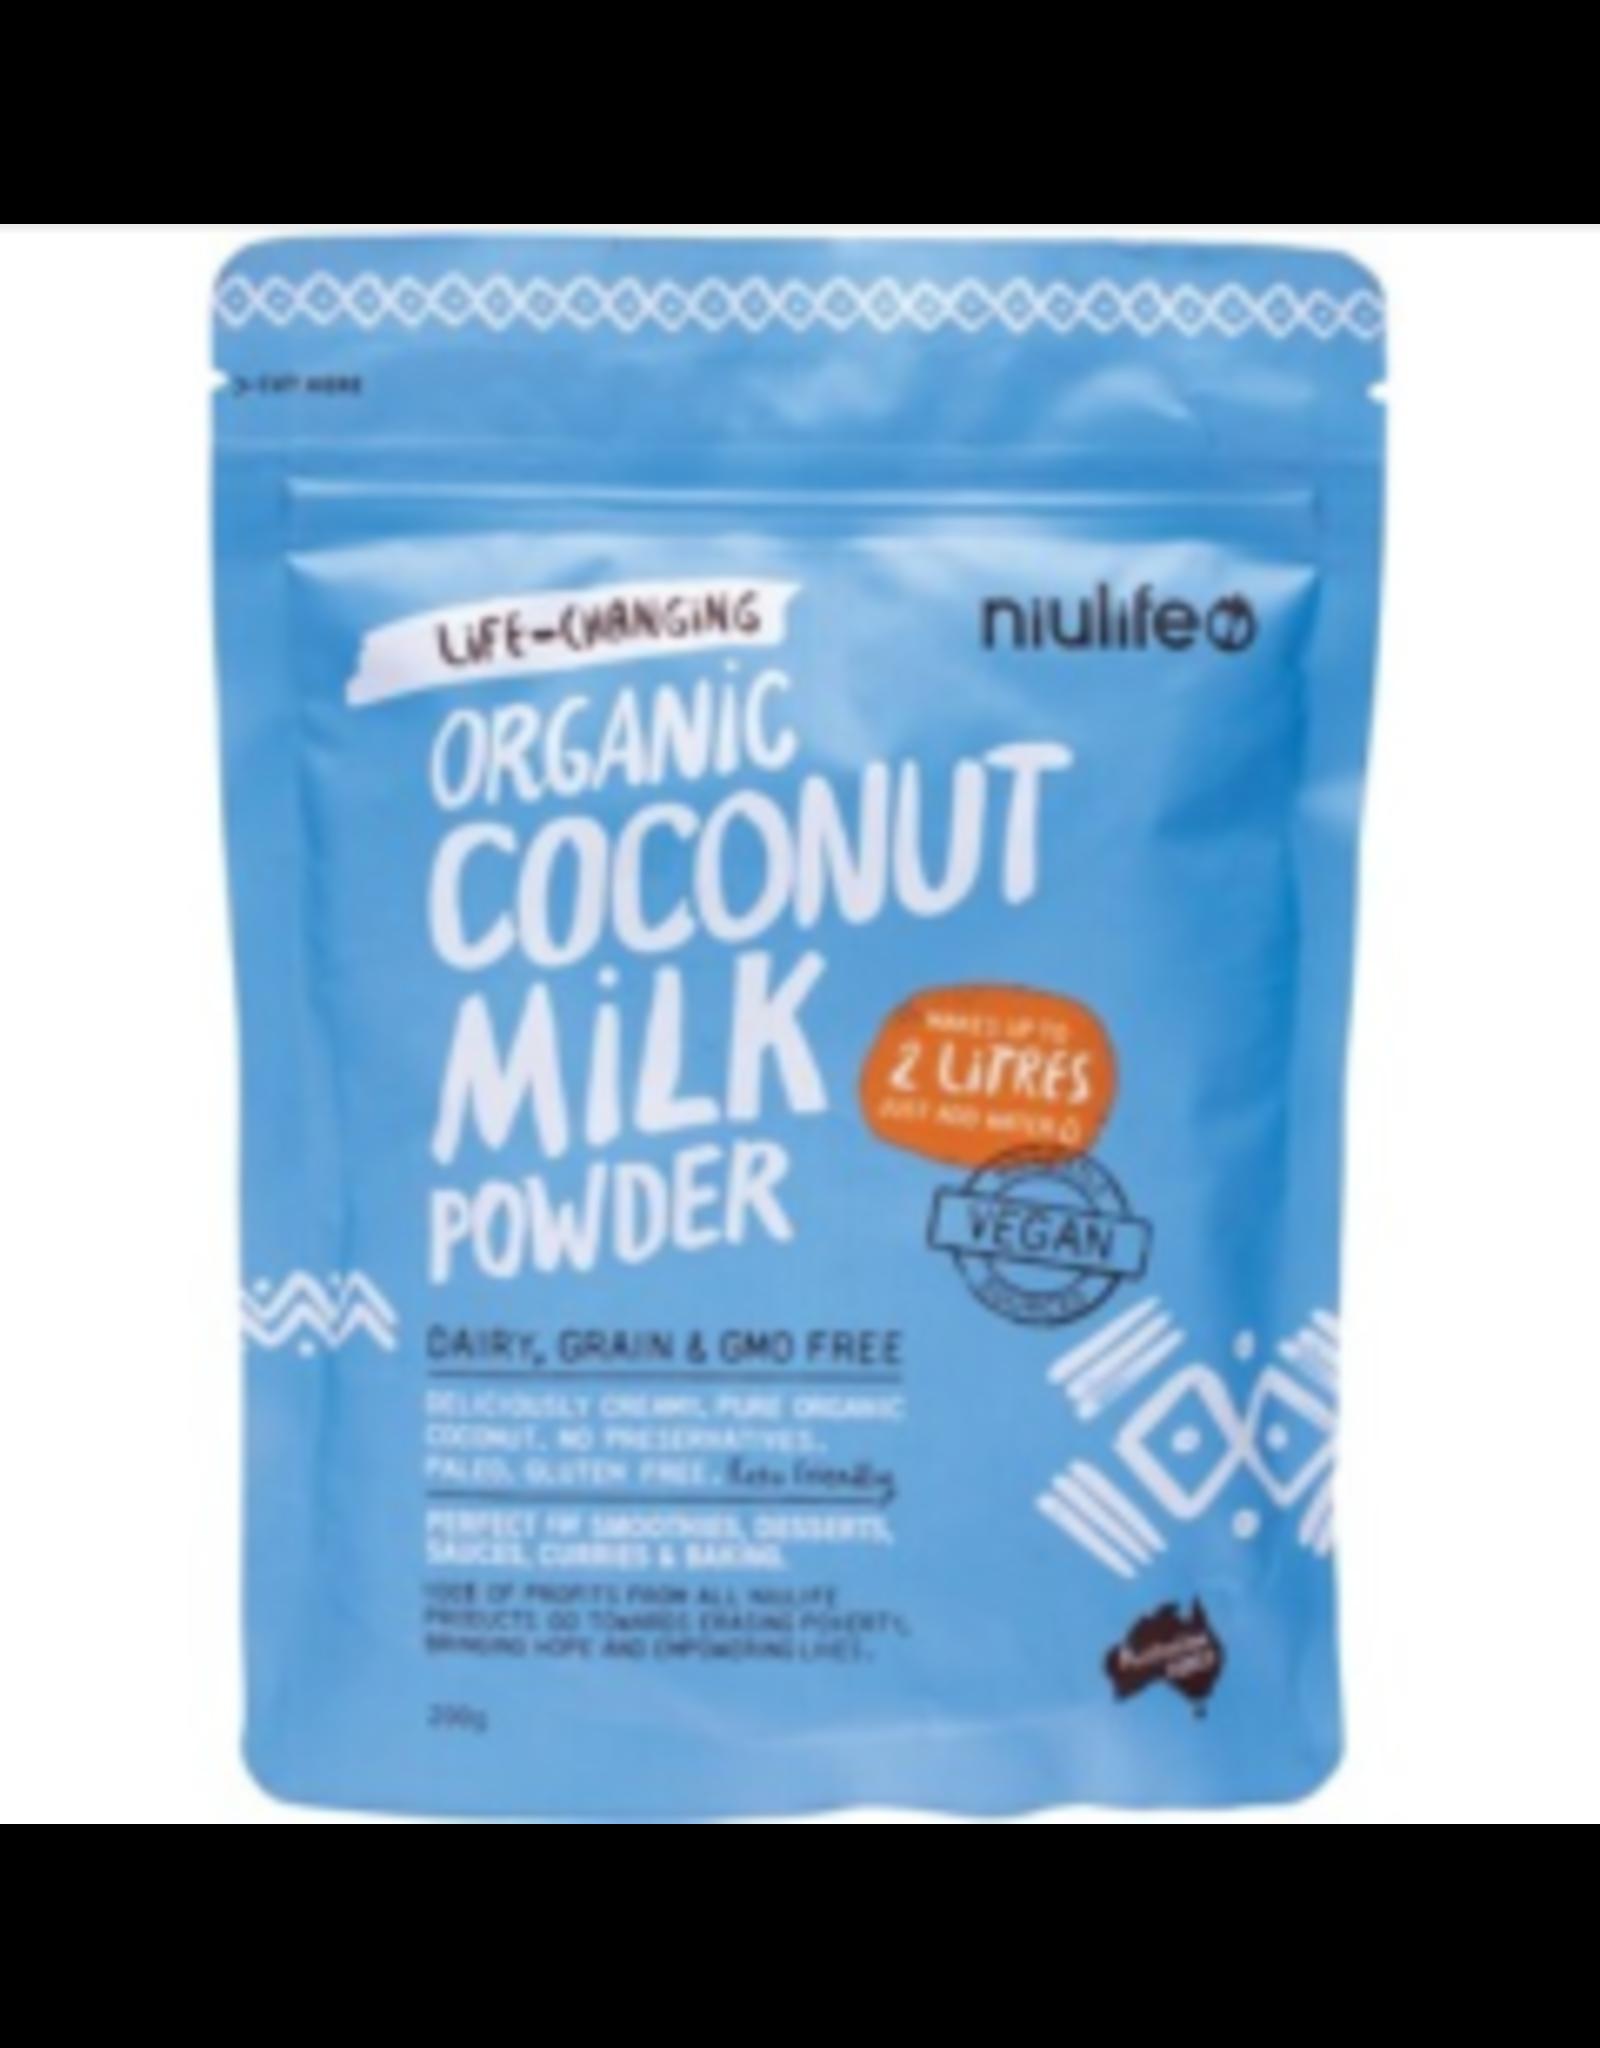 Niulife Coconut Milk Powder 200g